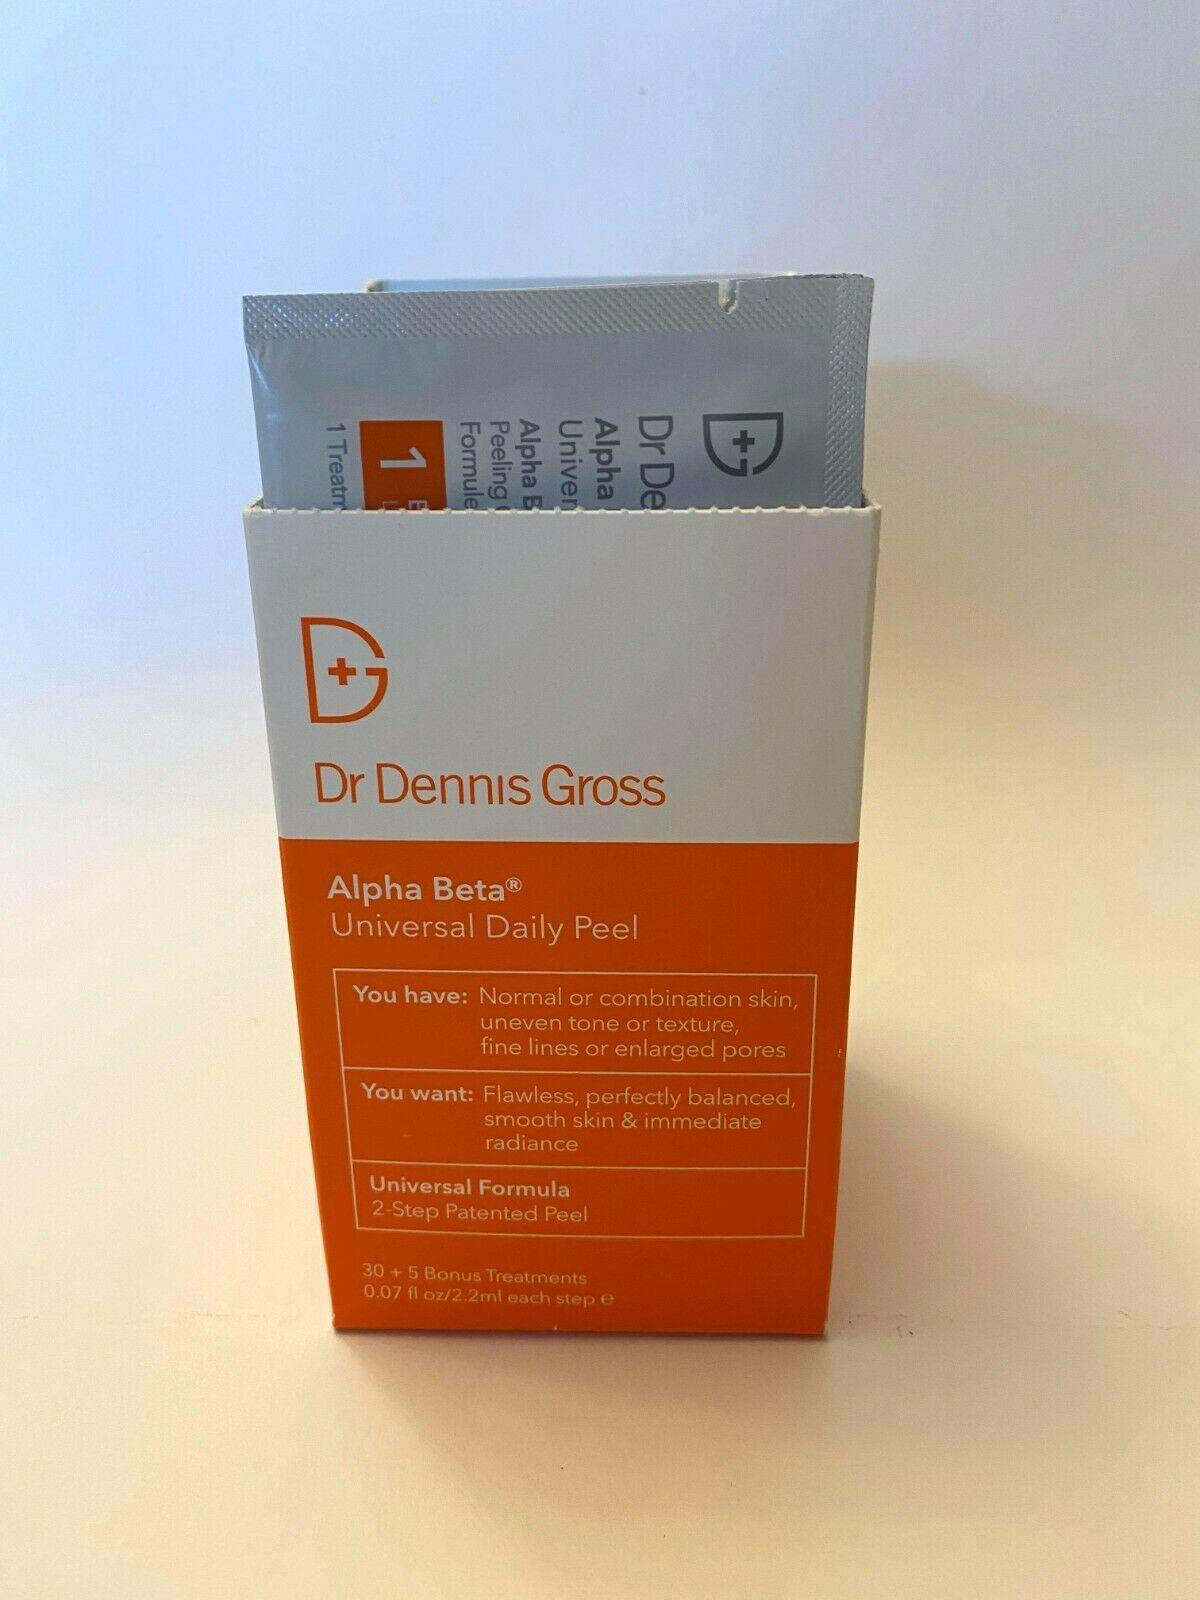 Dr Dennis Gross Alpha Beta universal Daily Peel 30 Count 10/21 Expiry Open Box - $48.22